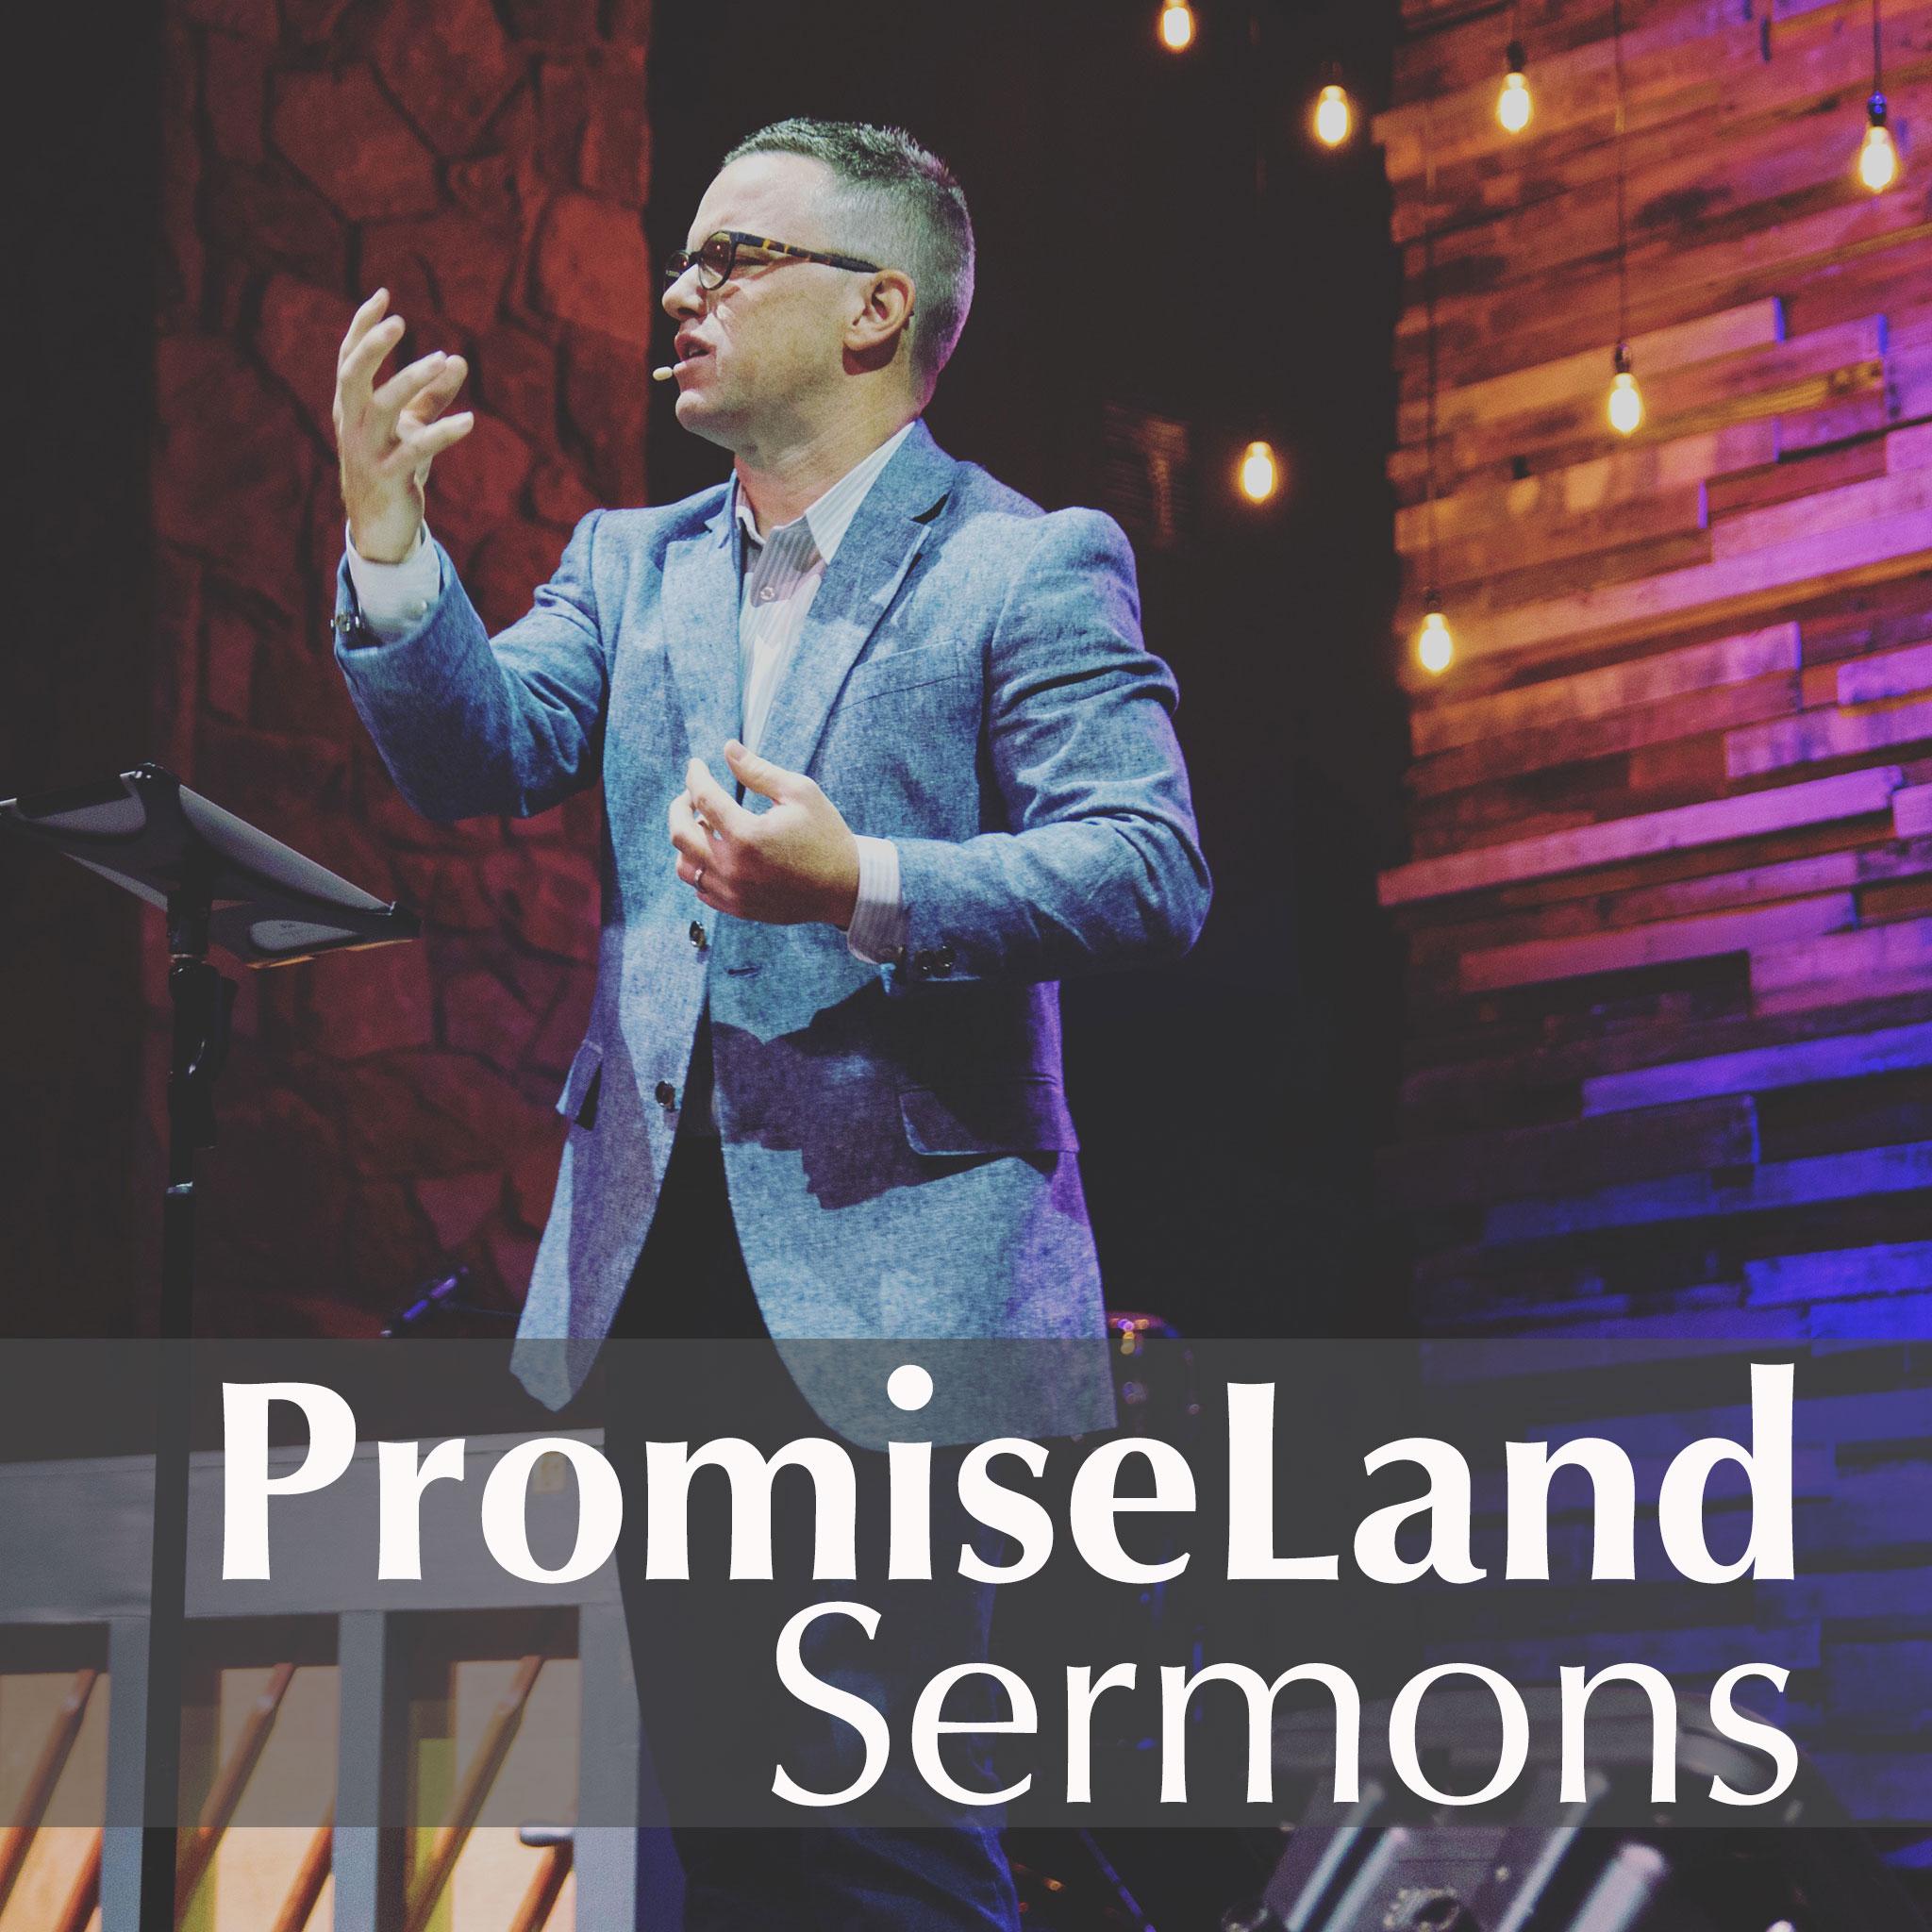 PromiseLand Sermons